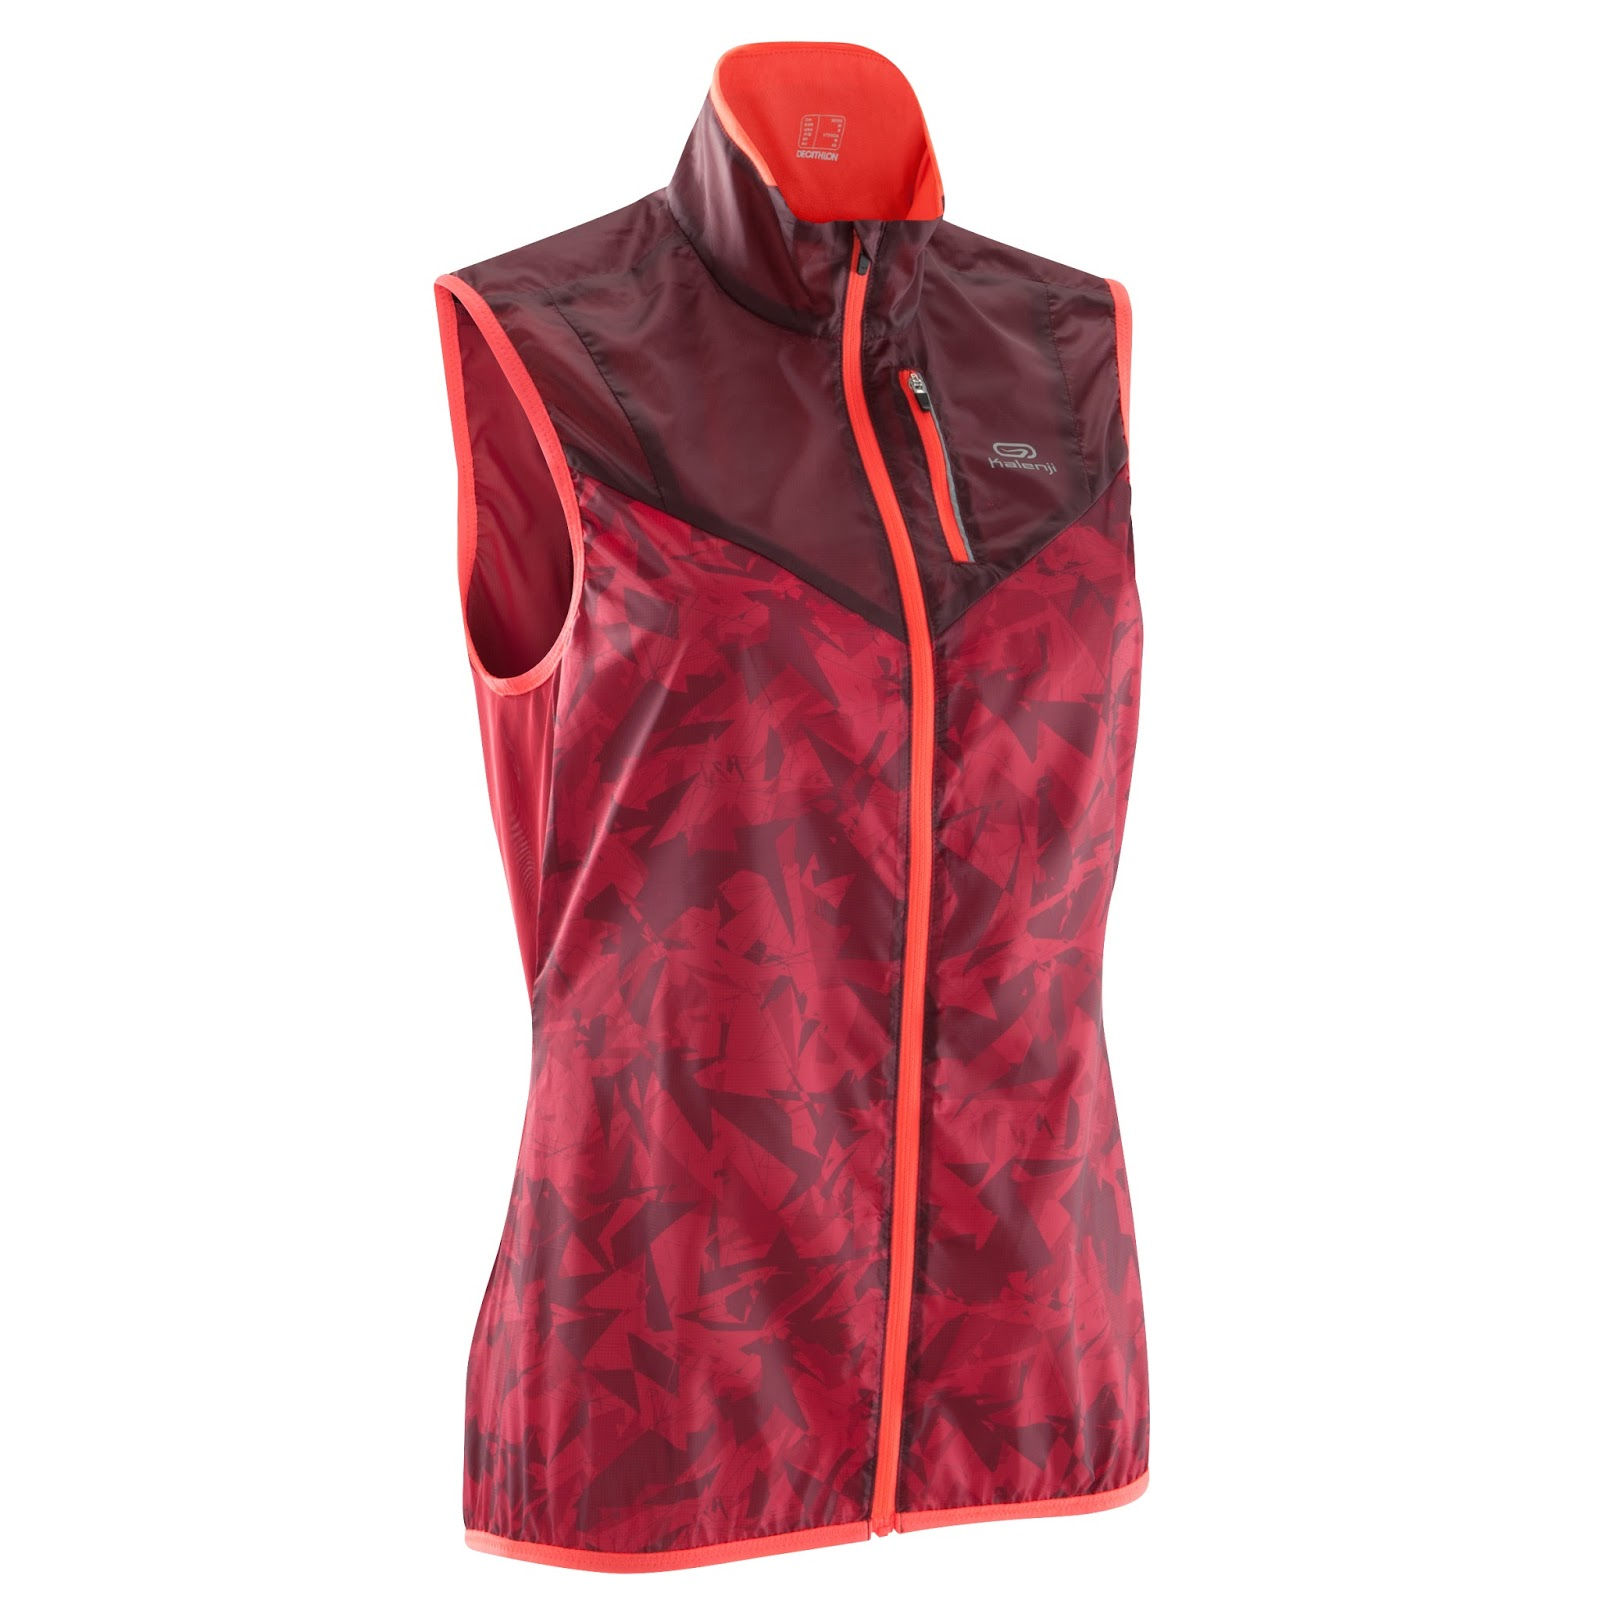 c4a725ca8d Metamorphose Concept - Fitness, Wellness & Lifestyle Blogger: TRAIL ...